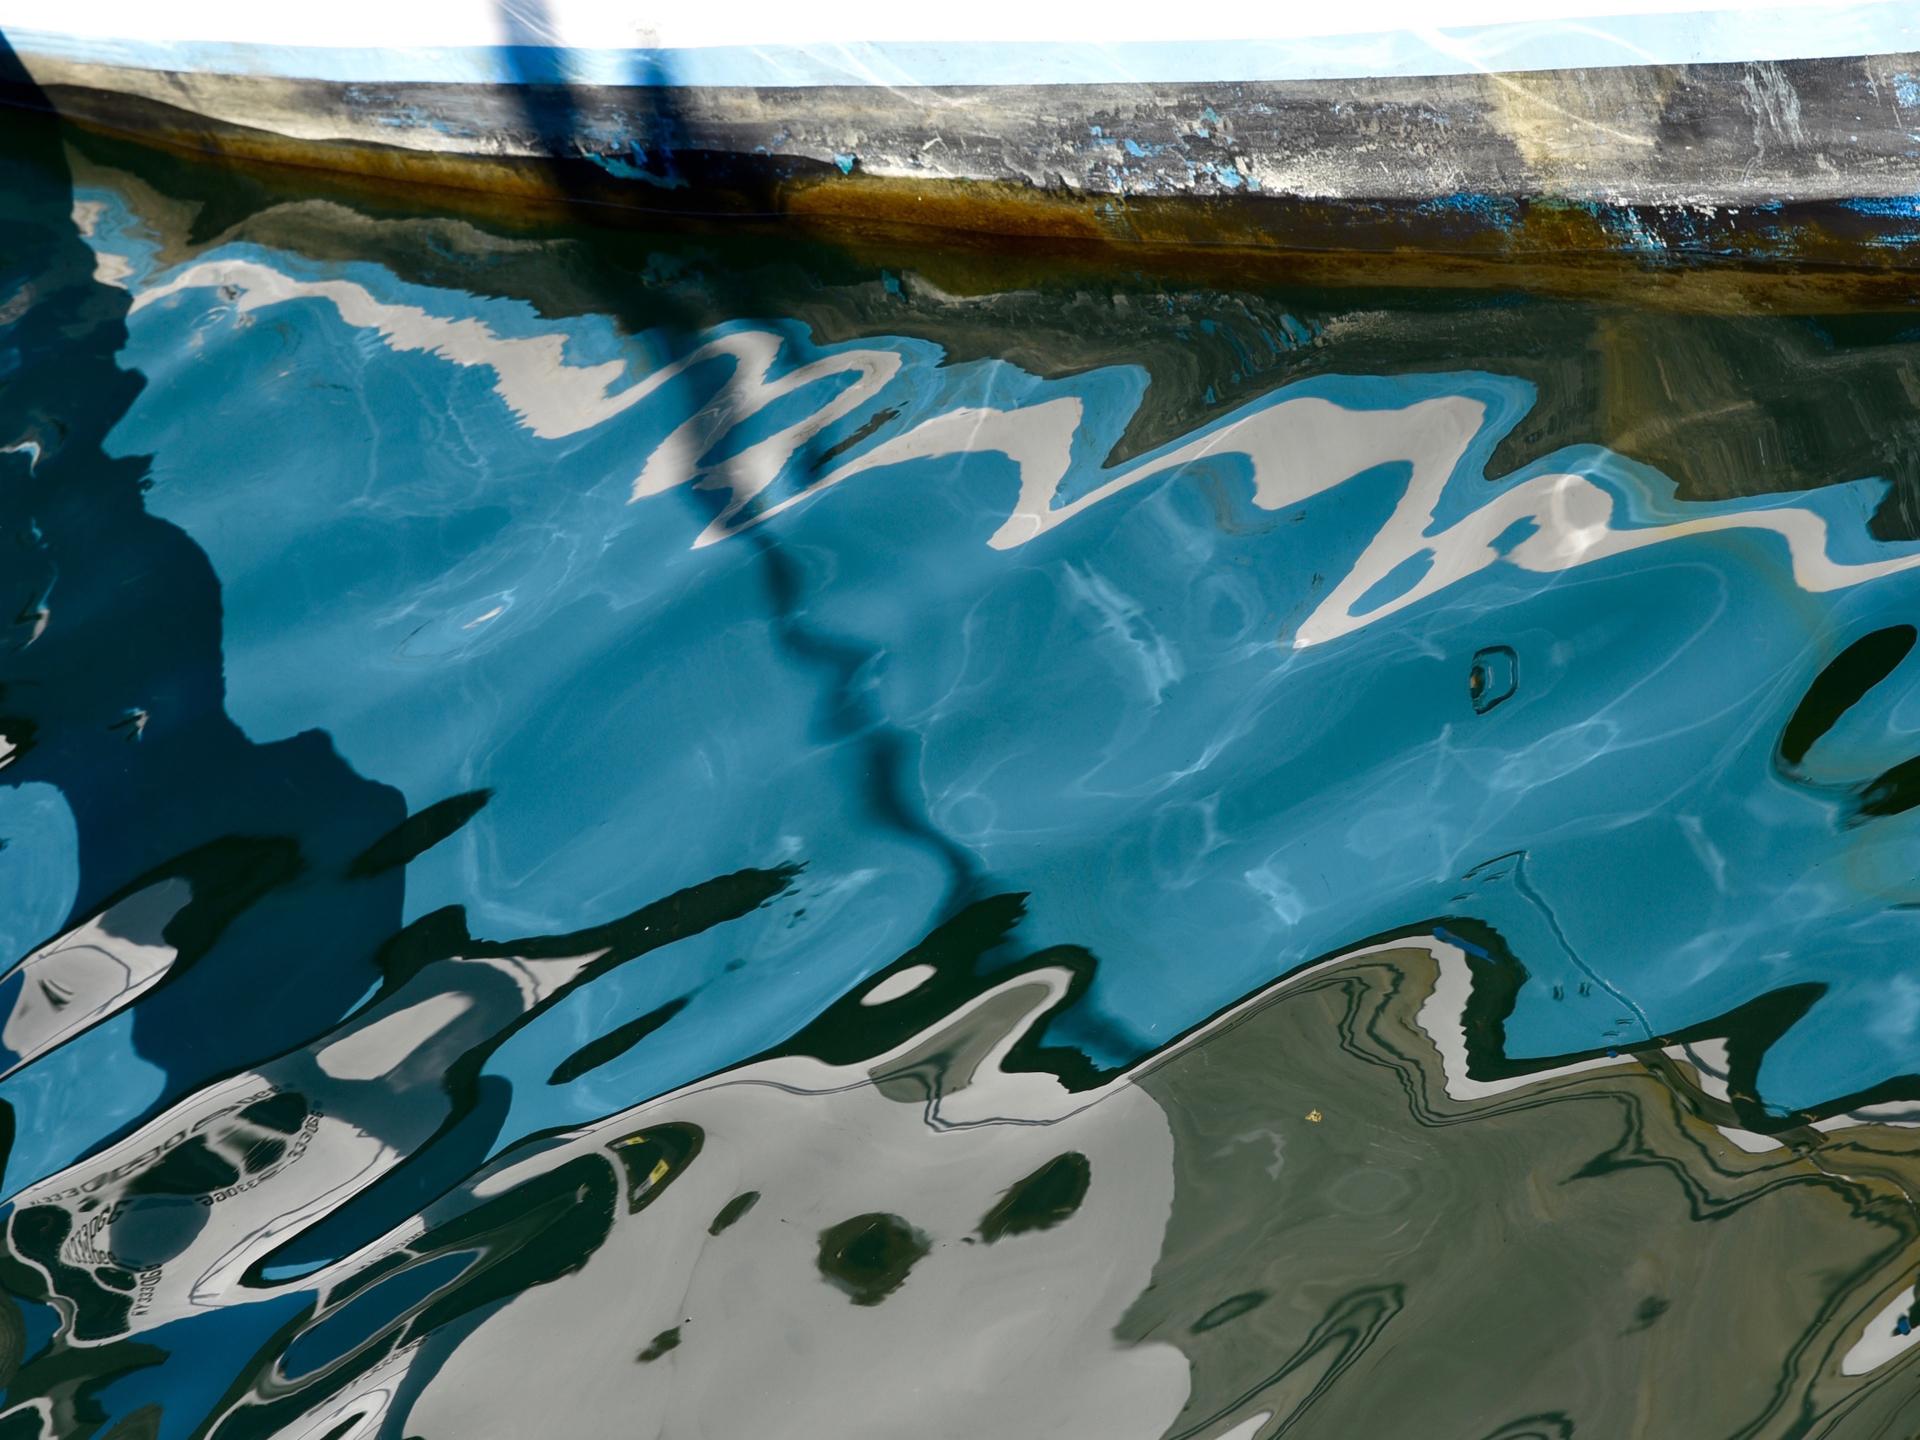 Montauk Reflections #2  by Kat O'Neill